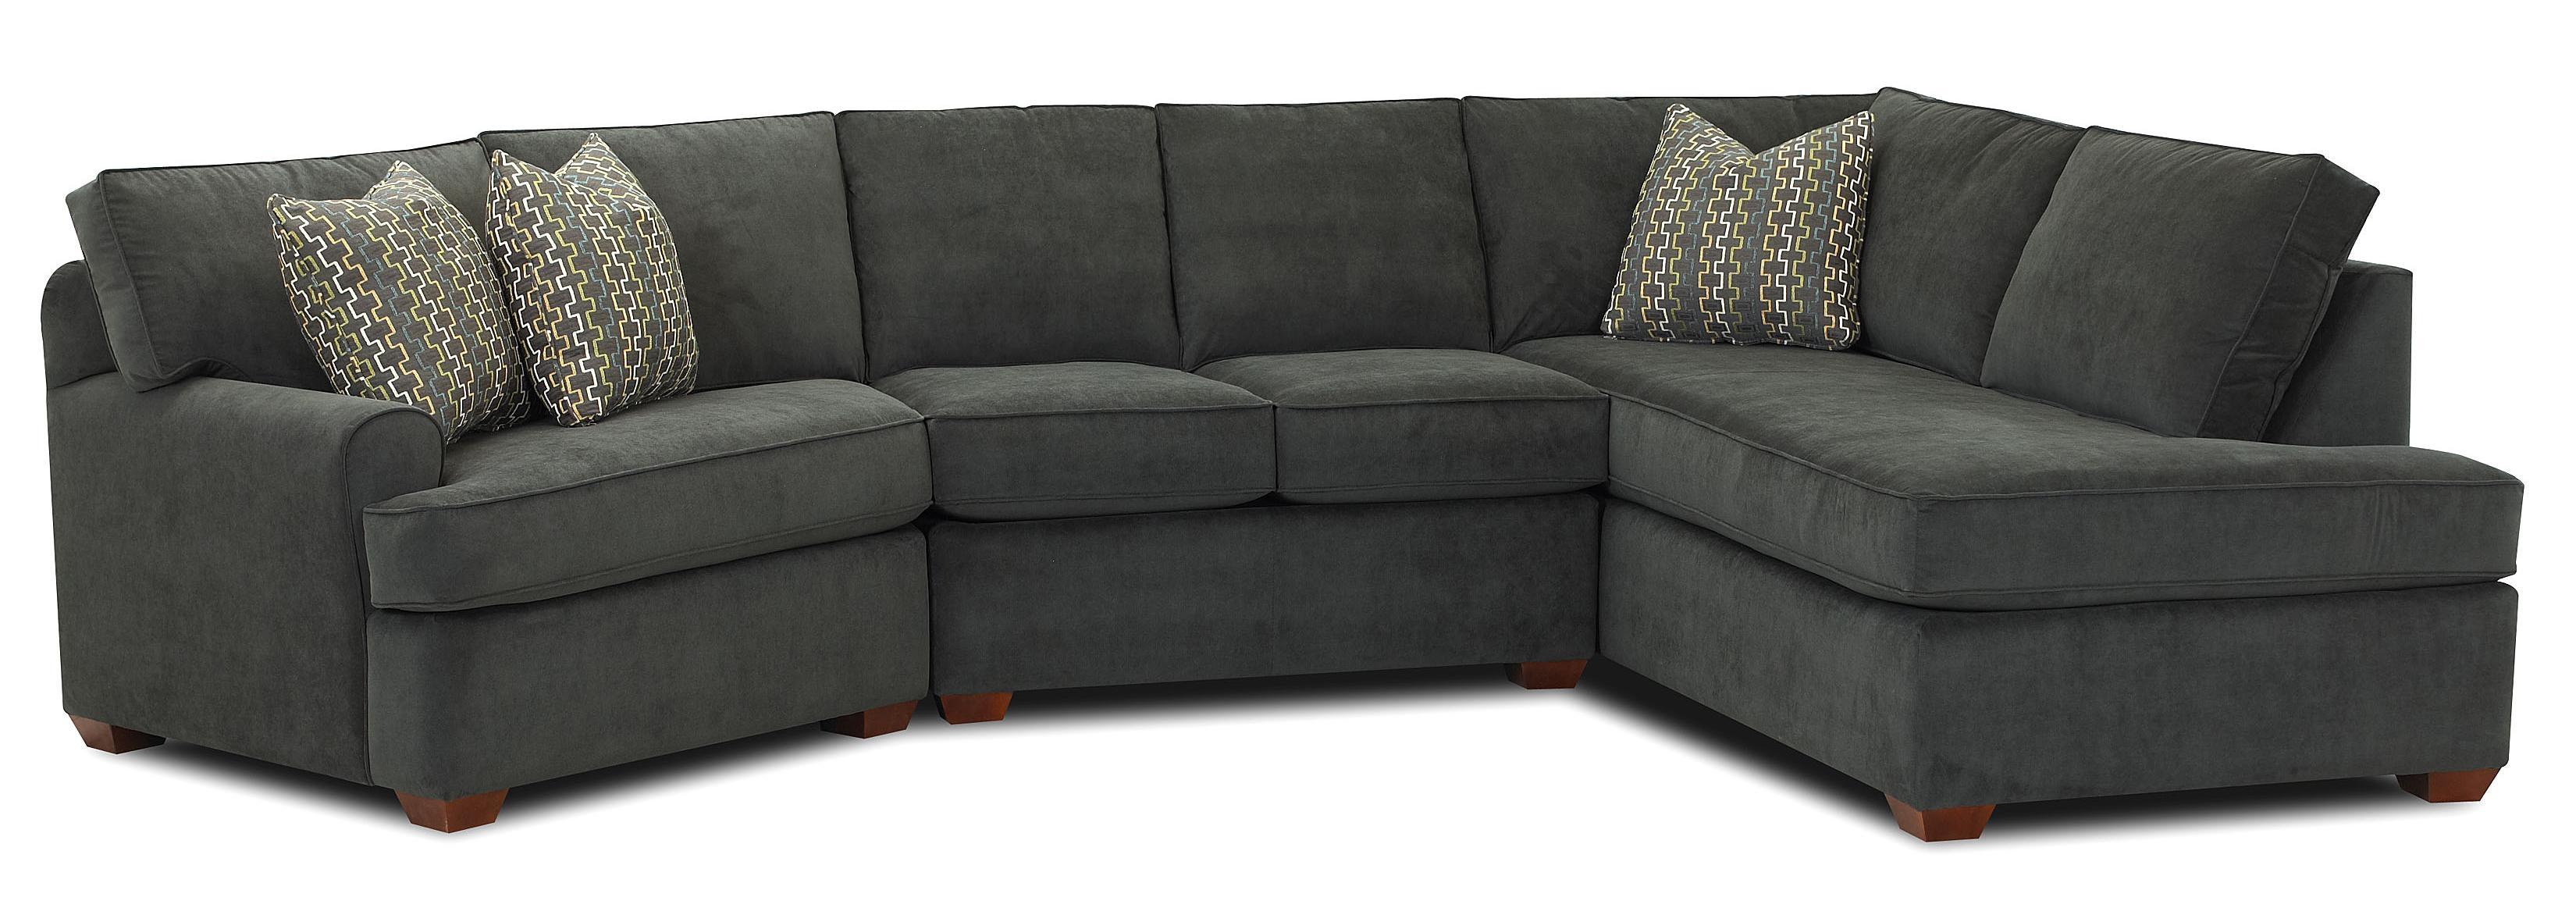 Angled Chaise Lounge Sofa Hereo Sofa Inside Angled Chaise Sofa (#2 of 12)